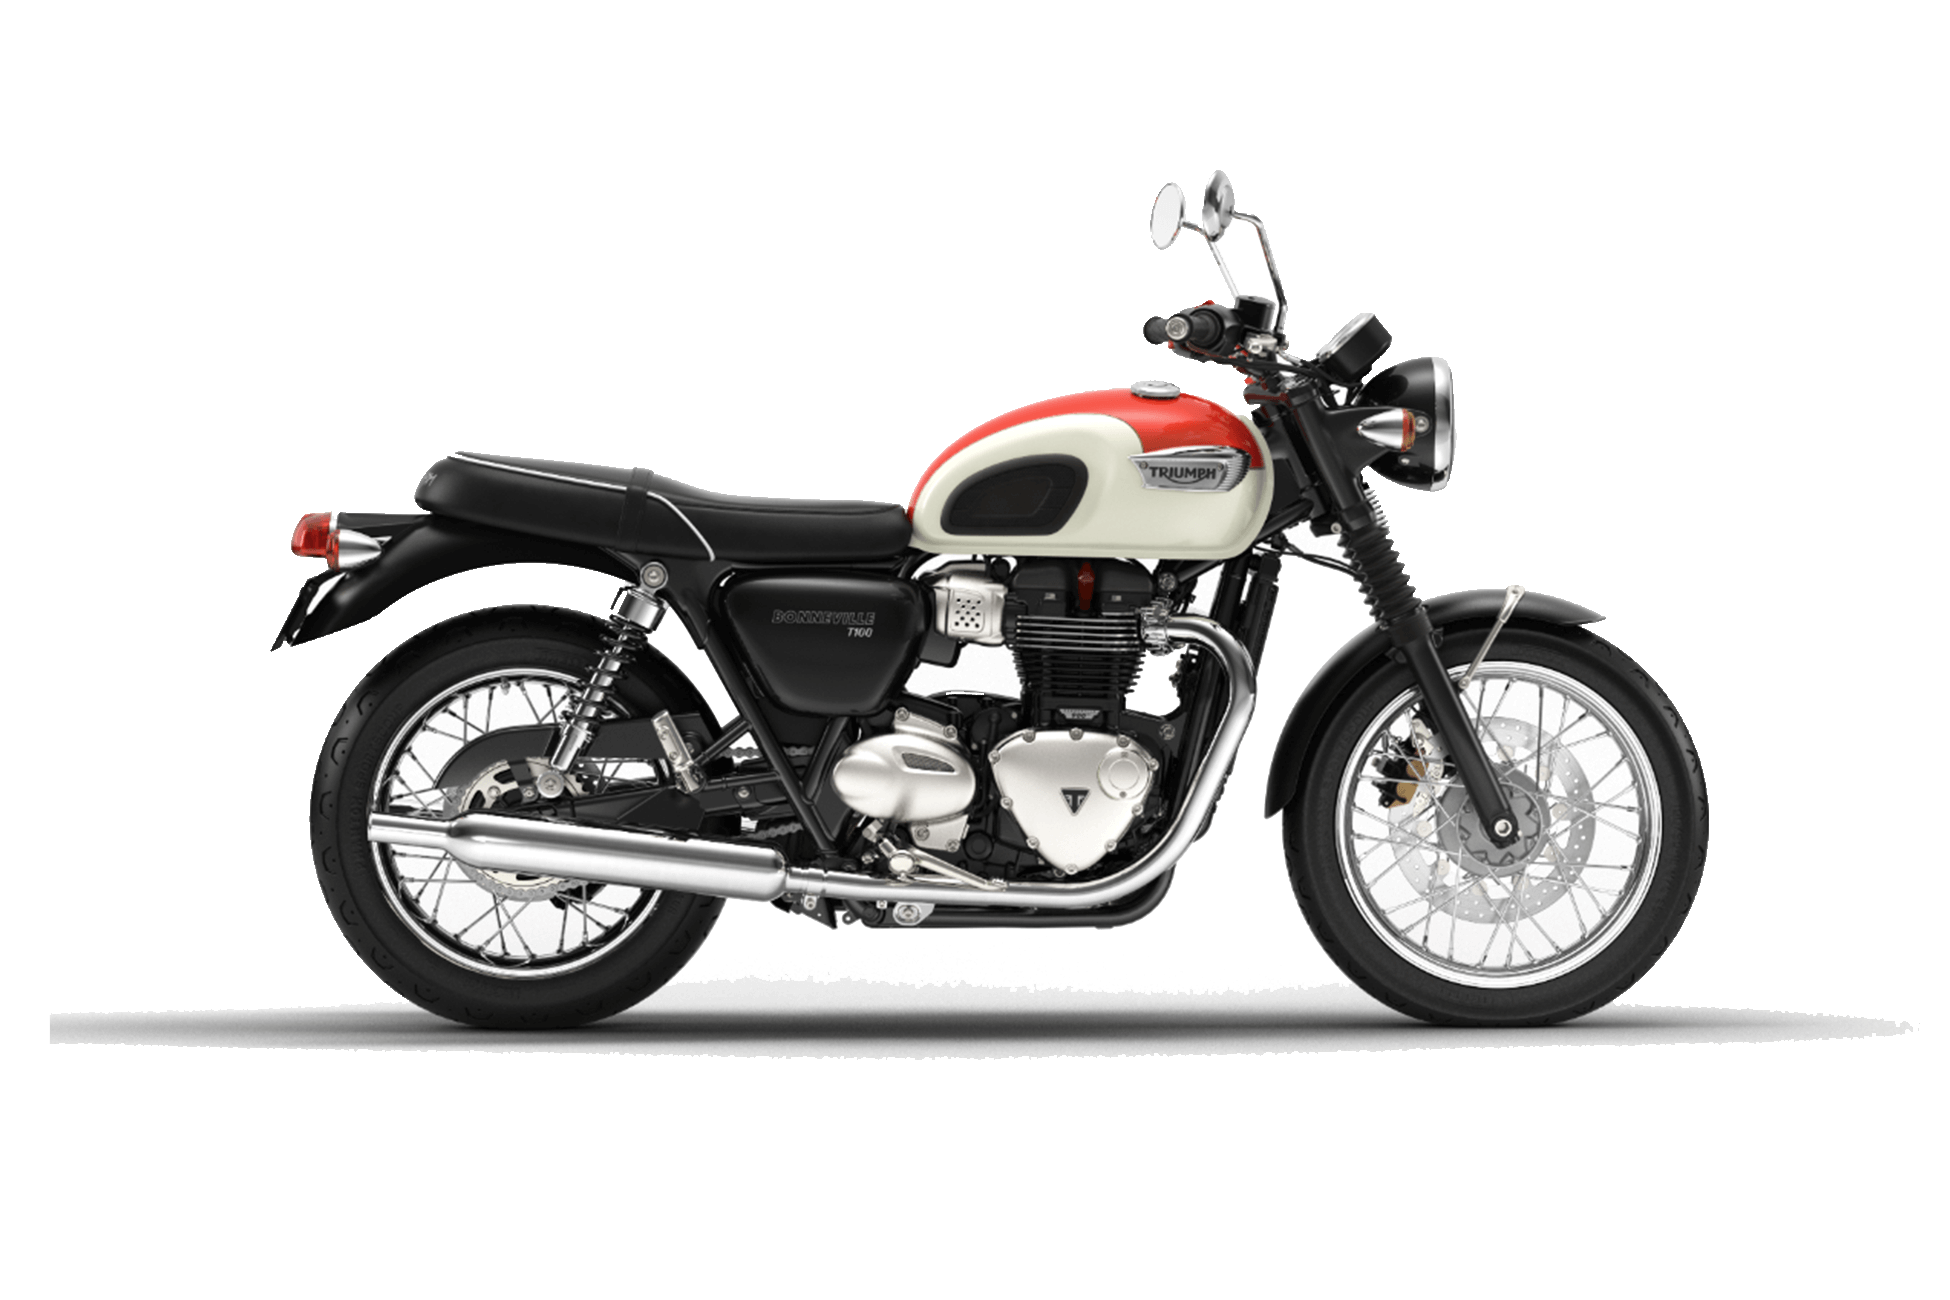 2019 Bonneville T100 For Sale In Gladstone, OR l Latus